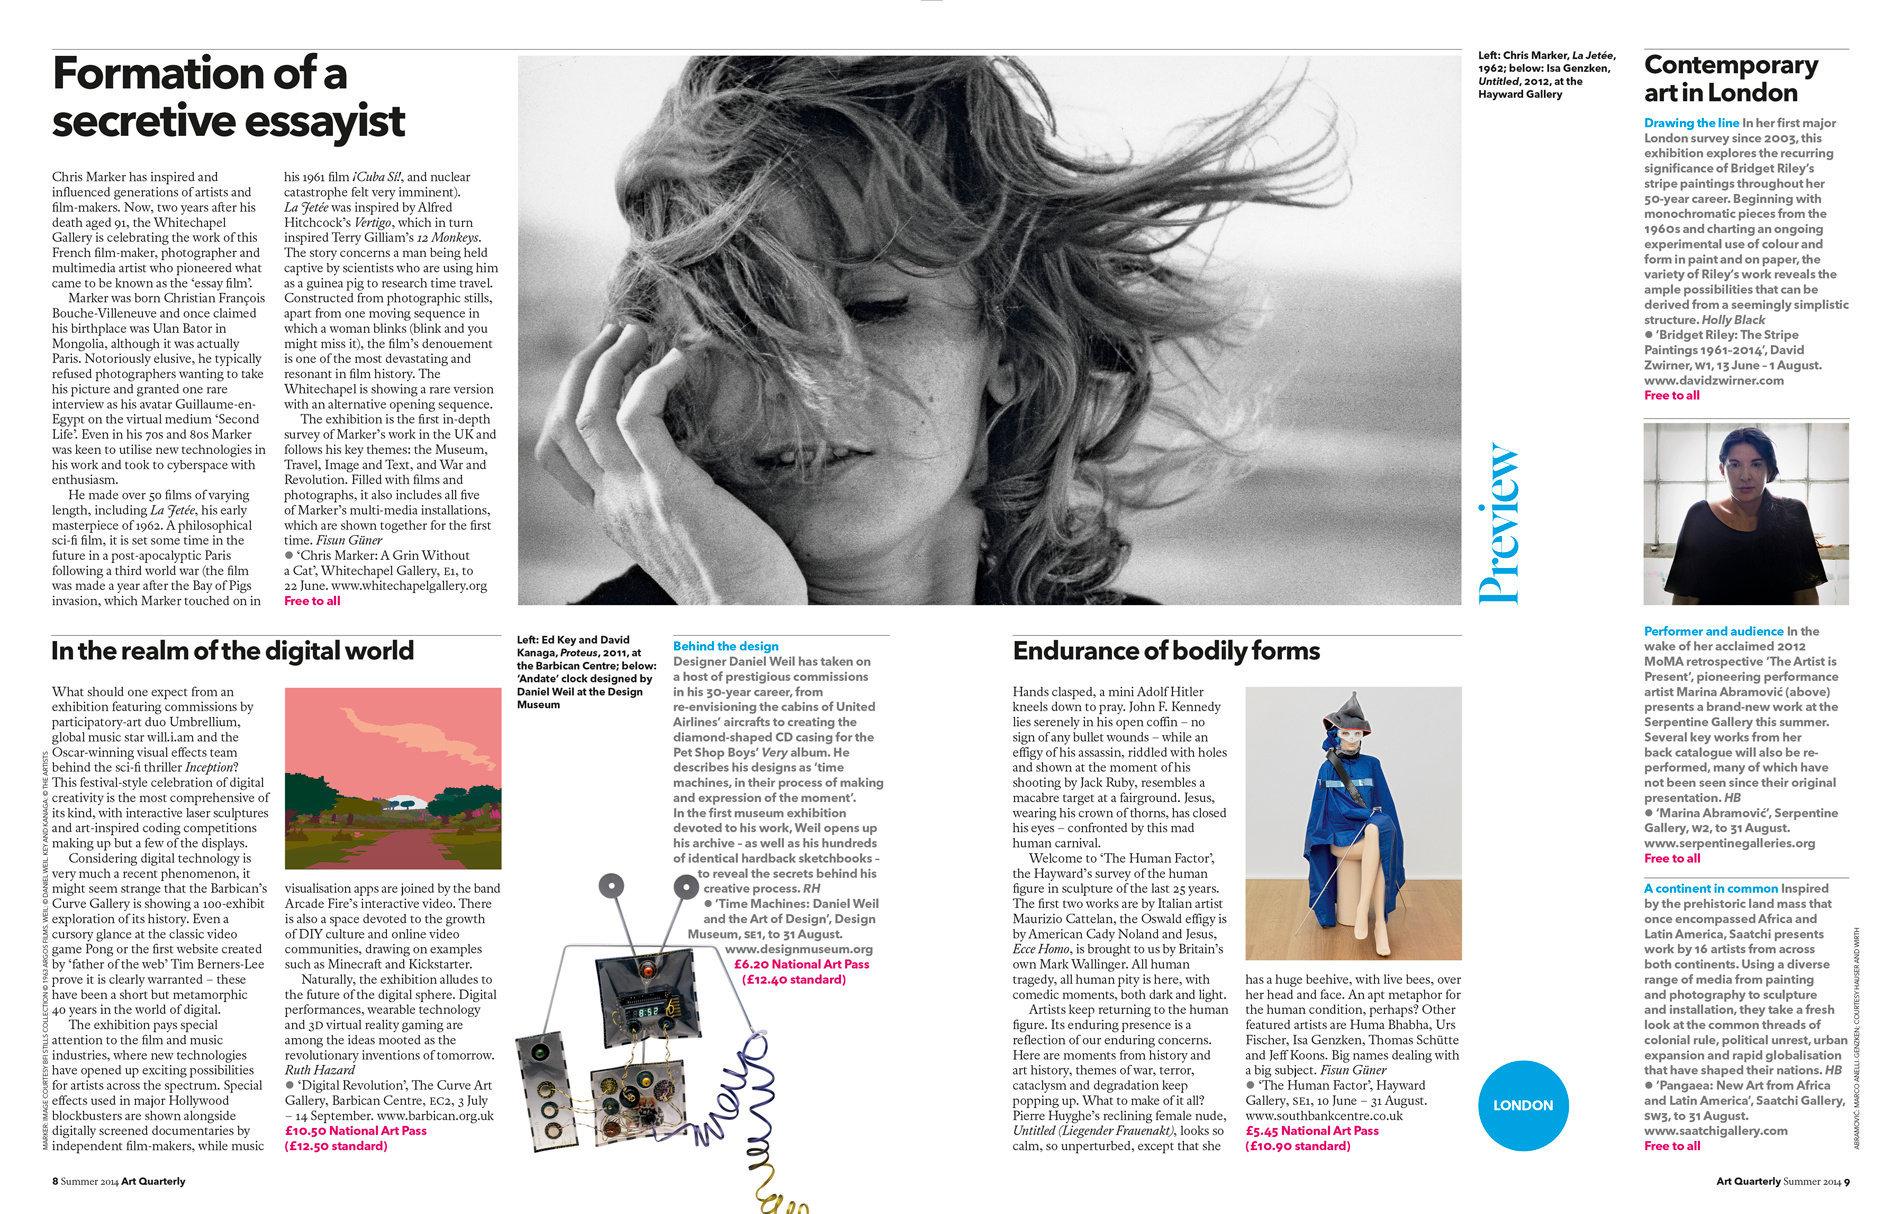 Art Quarterly Summer 2014